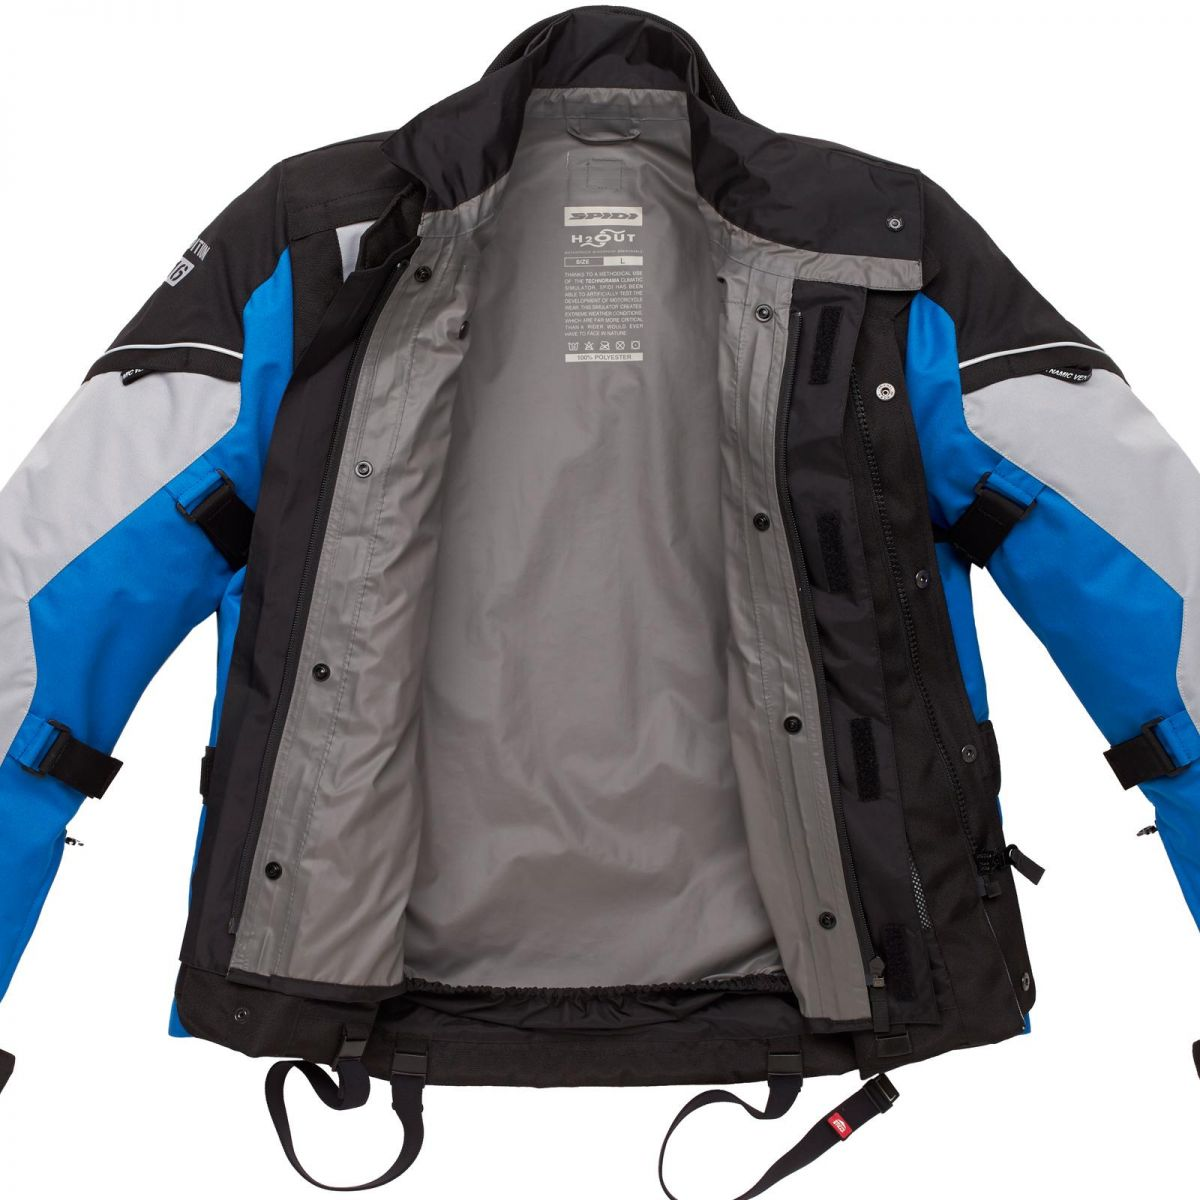 Jaqueta Spidi Voyager 3 H2Out Dark/ Grey/Blue ( Big Trail - Parka )  - Nova Centro Boutique Roupas para Motociclistas